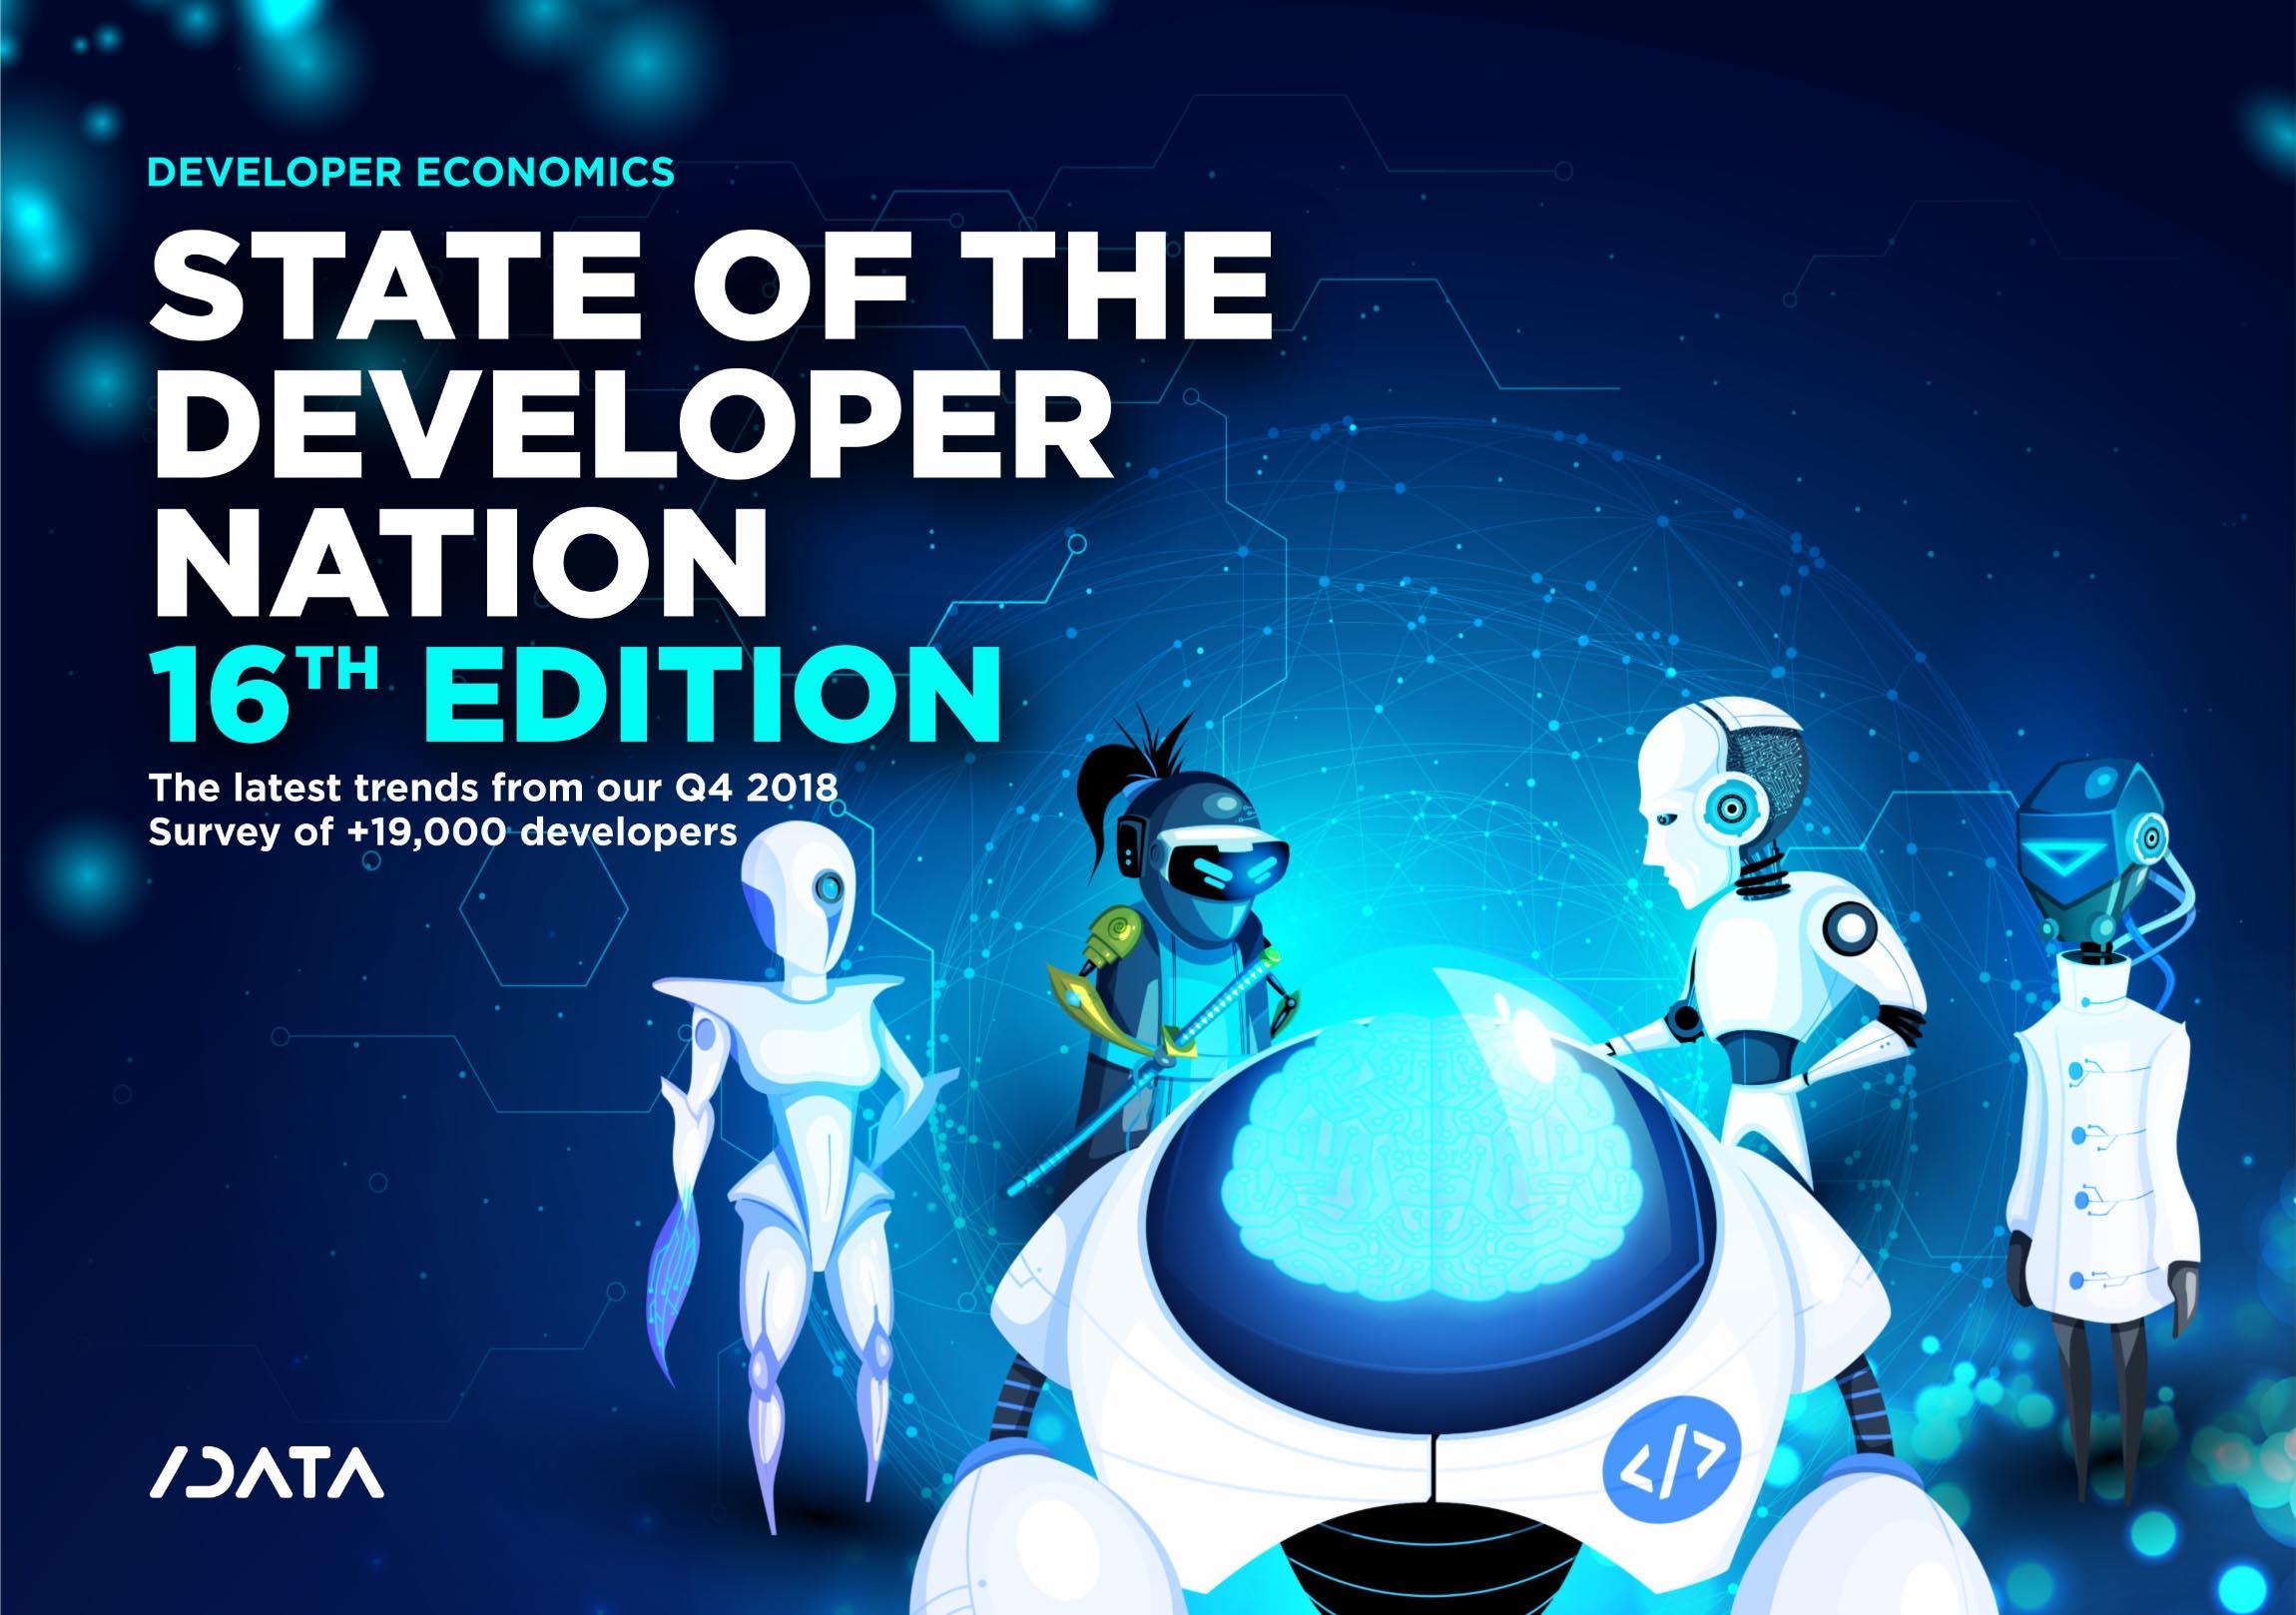 Developer Economics: State of the Developer Nation 16th Edition